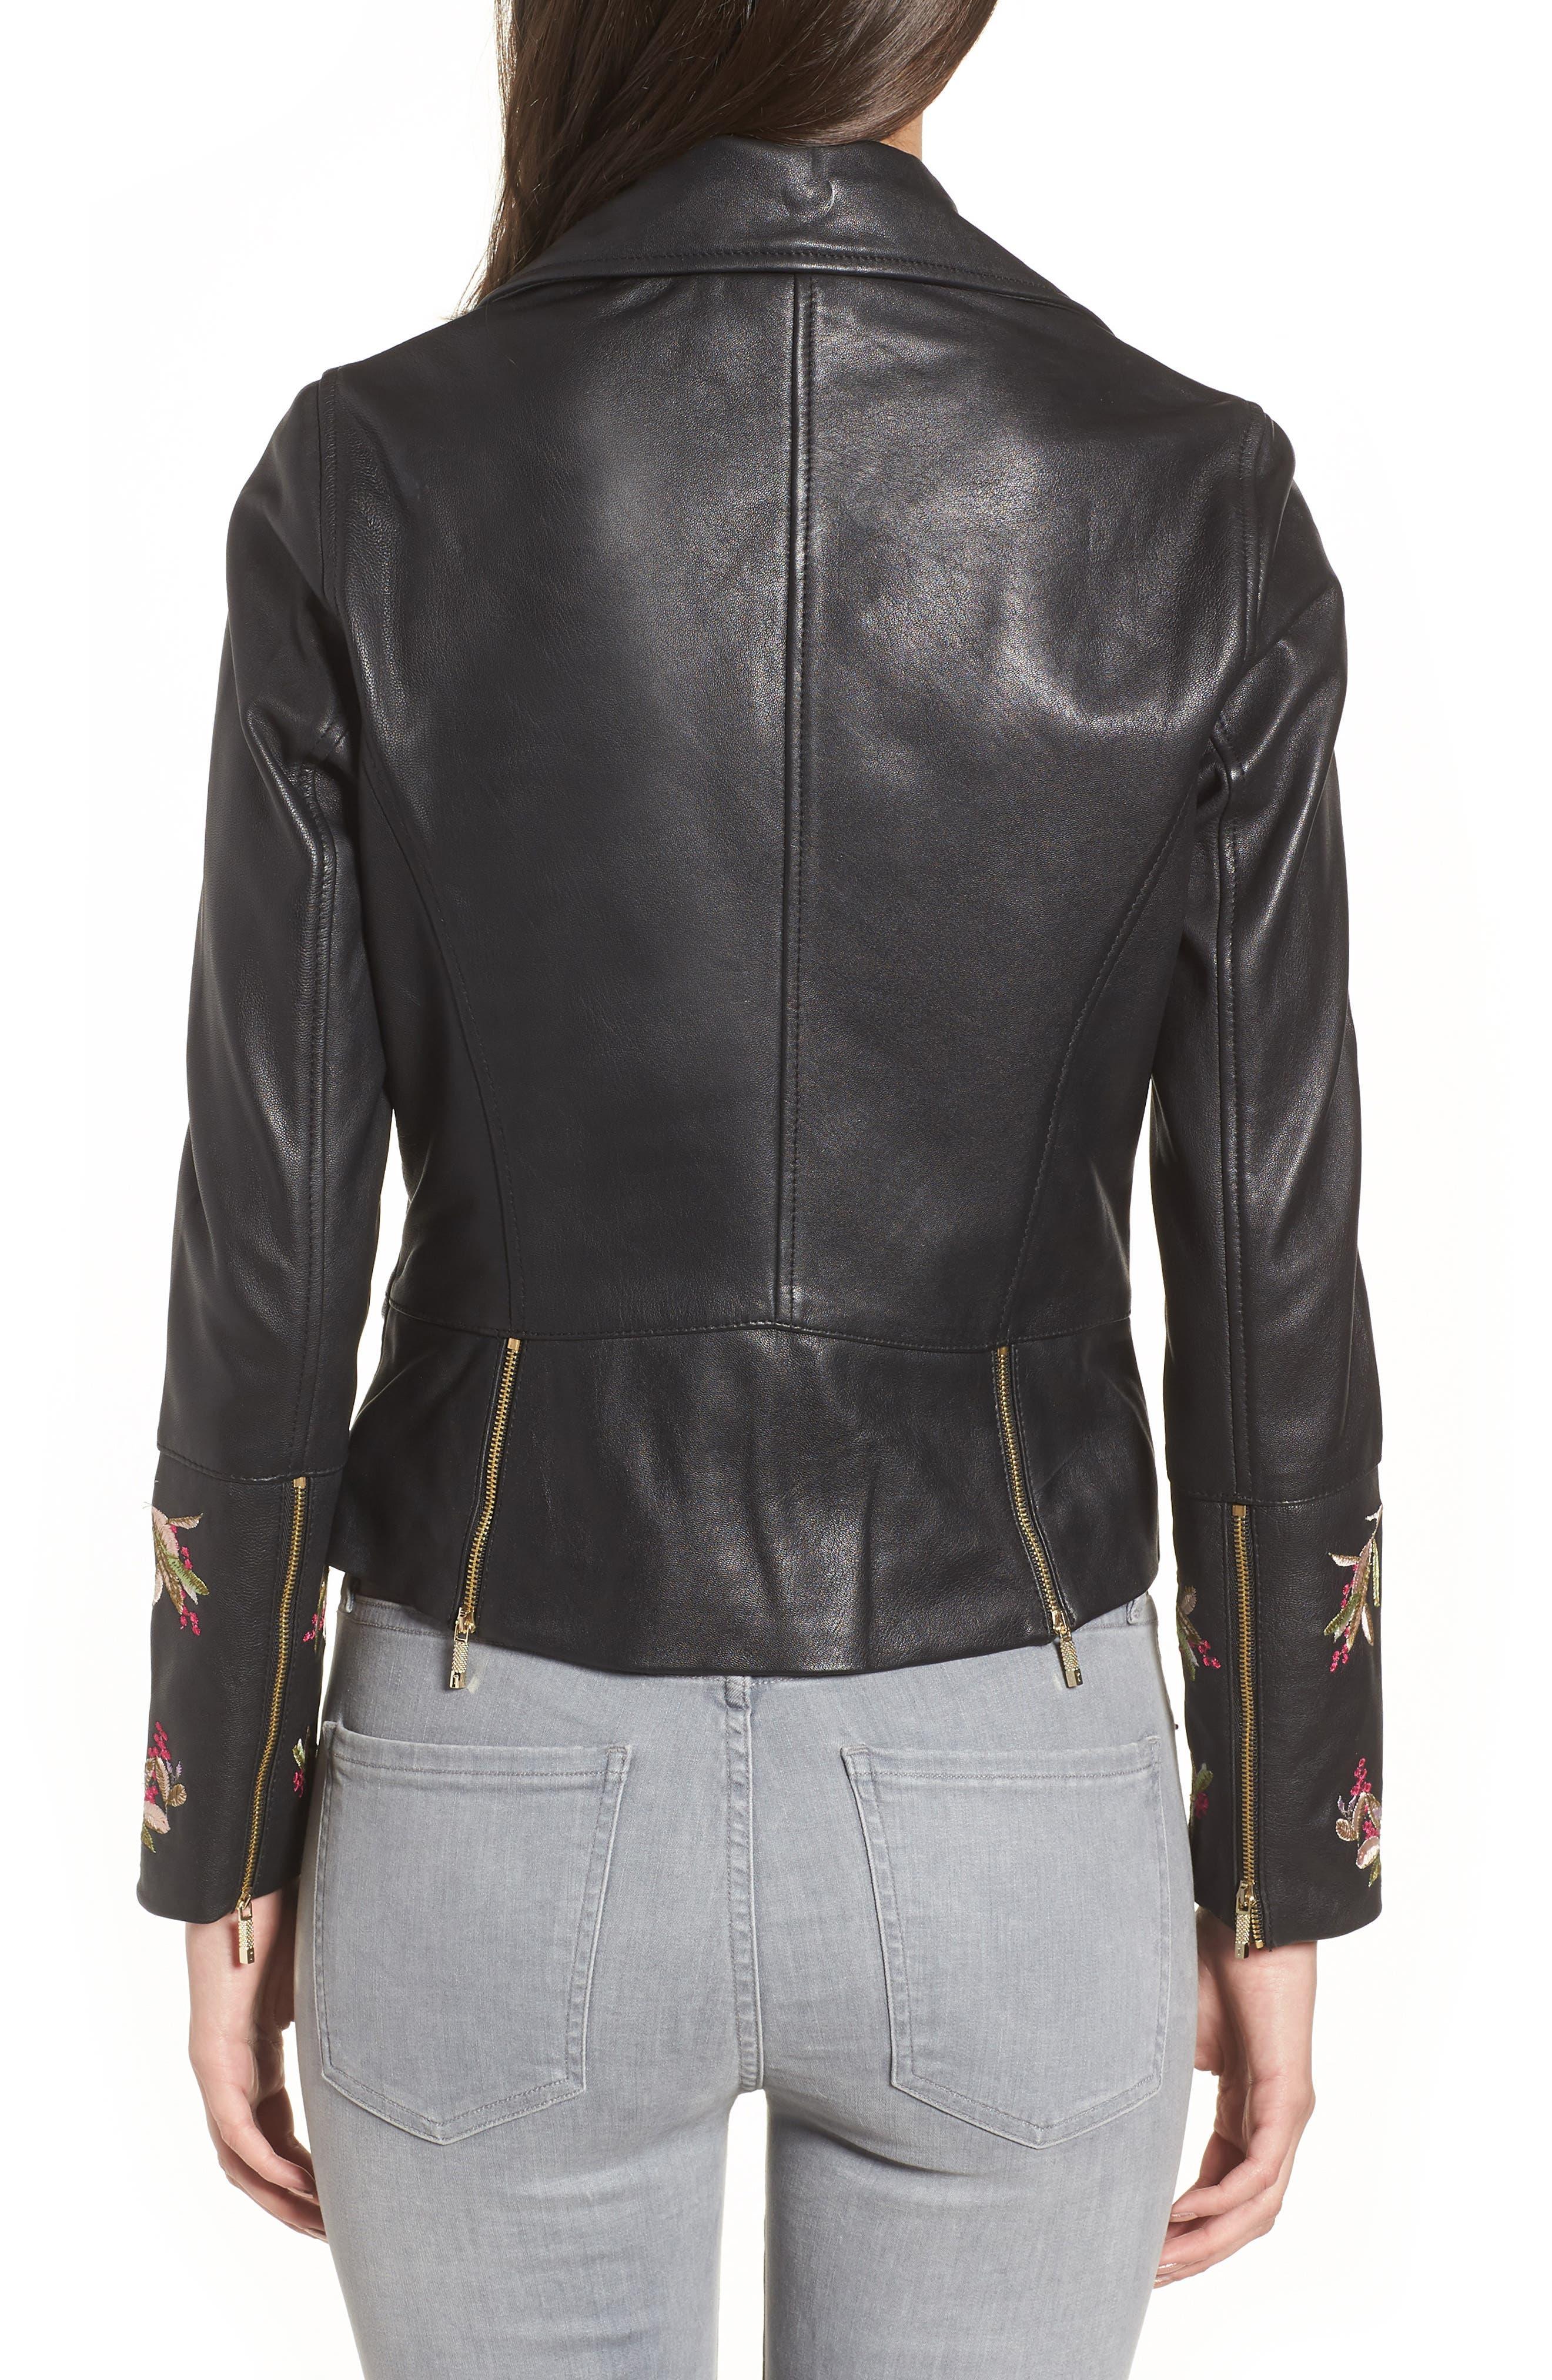 Highgrove Leather BIker Jacket,                             Alternate thumbnail 2, color,                             001